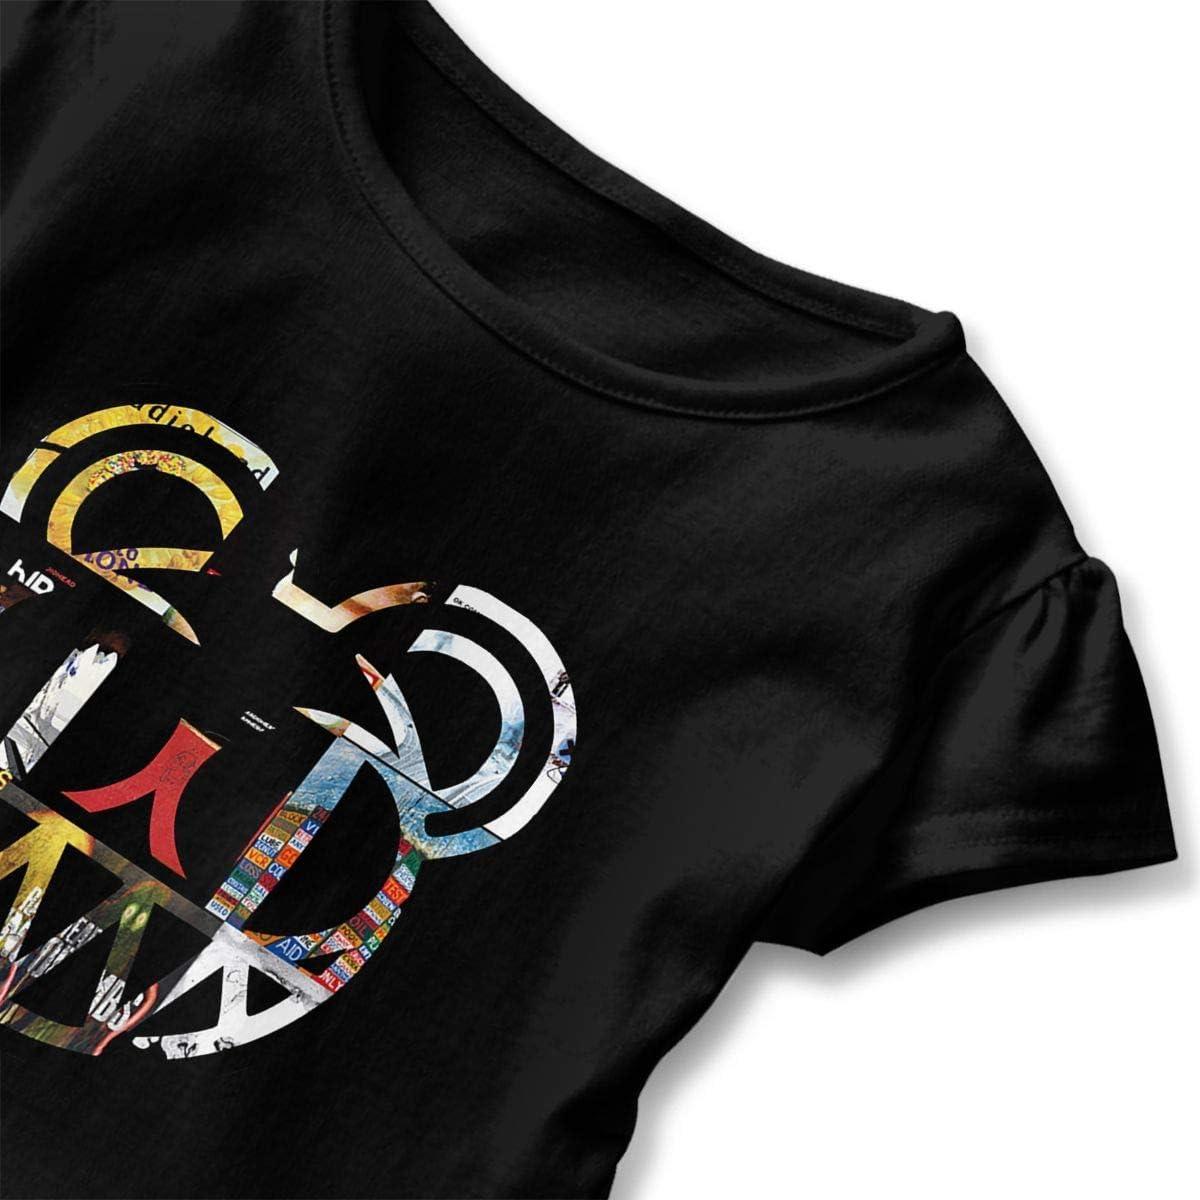 gregezrg Kid T Shirt MUtang Radiohead 3D Tee Baseball Ruffle Short Sleeve Cotton Shirts Top for Girls Kids